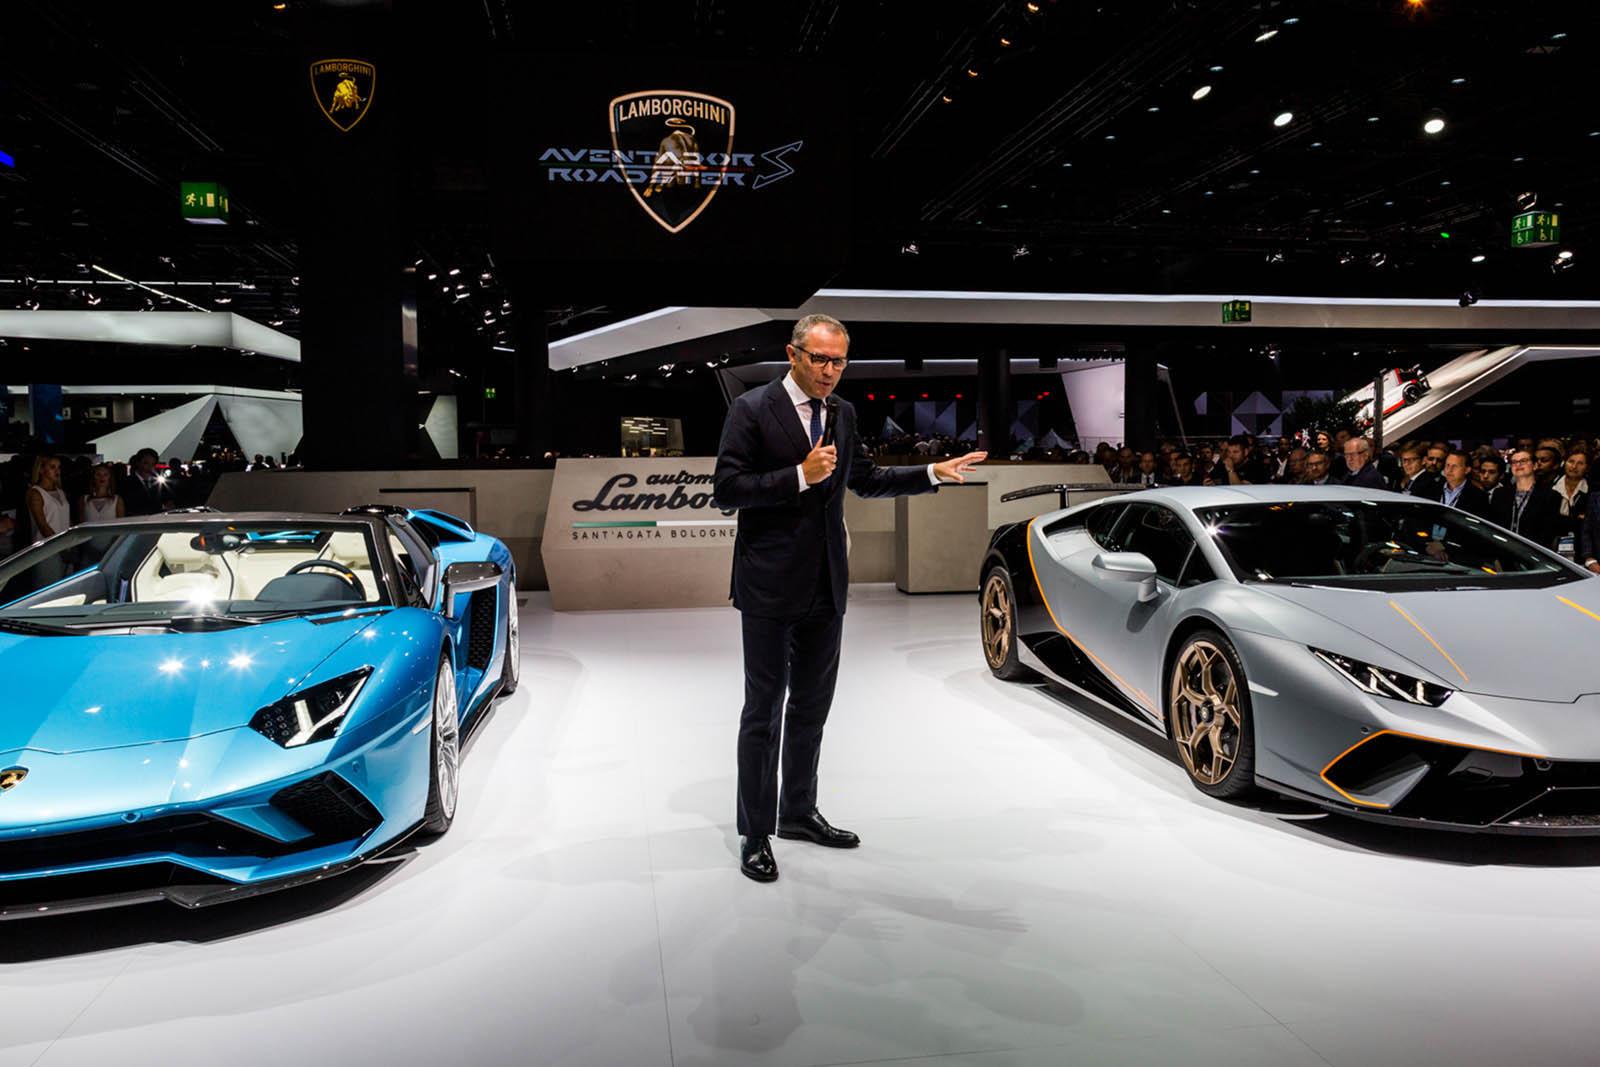 Lamborghini Aventador Roadster S facelift (6)